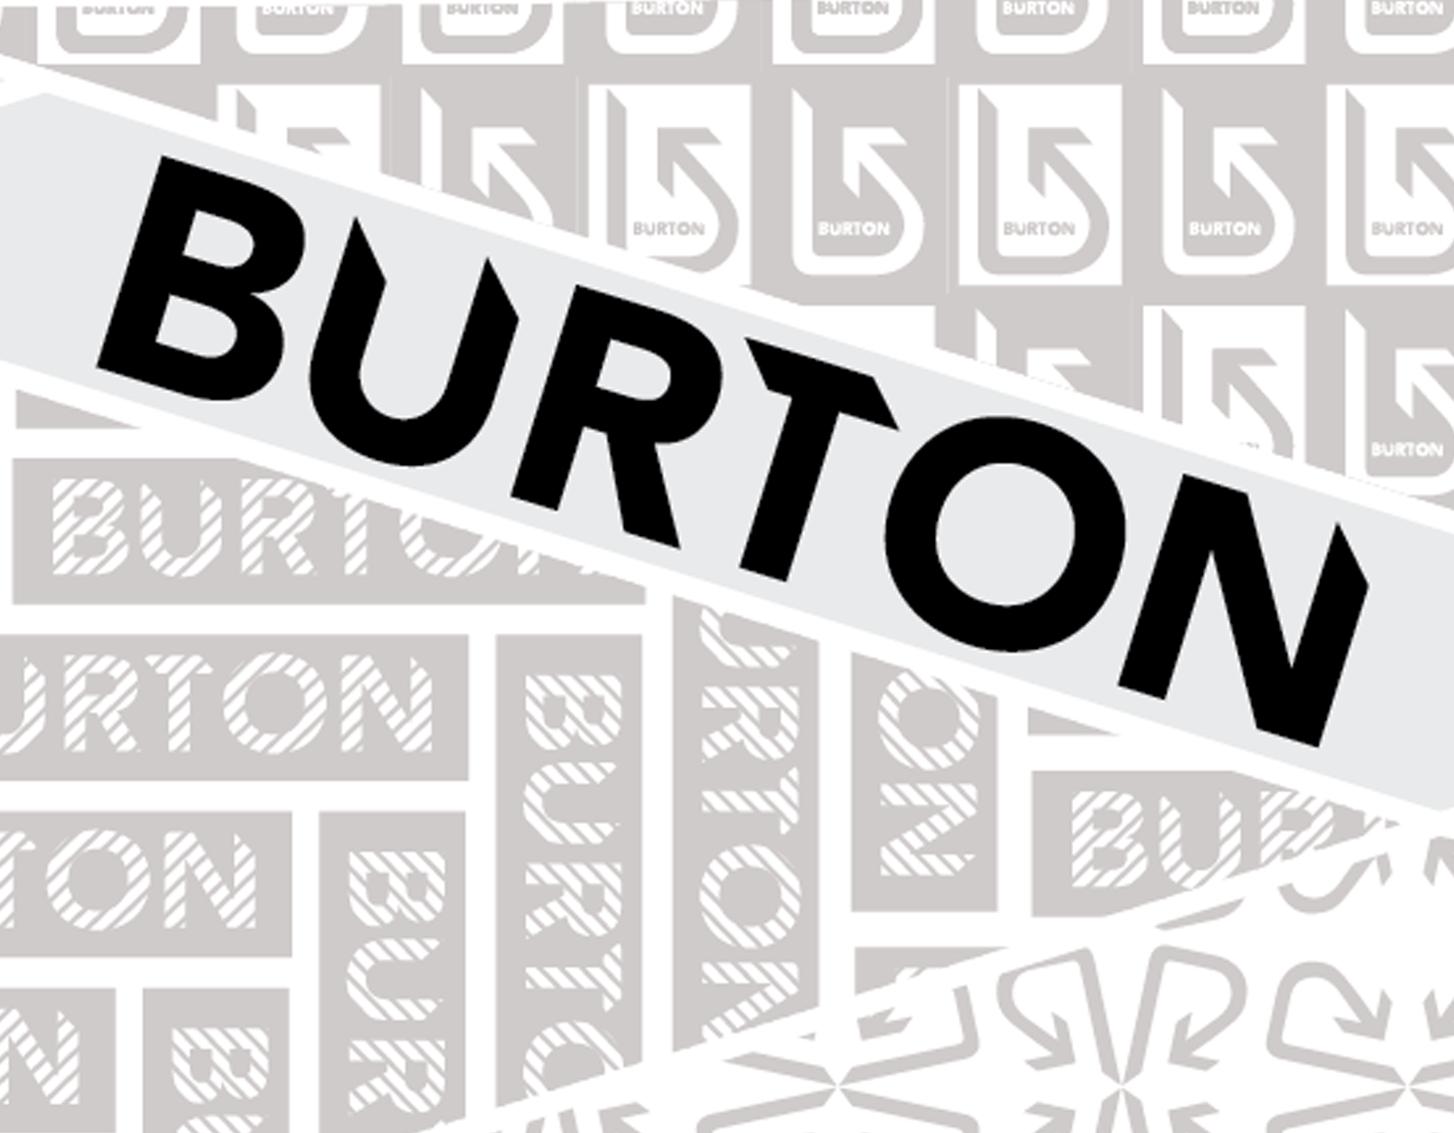 Burton Show Dog snowboard design detail